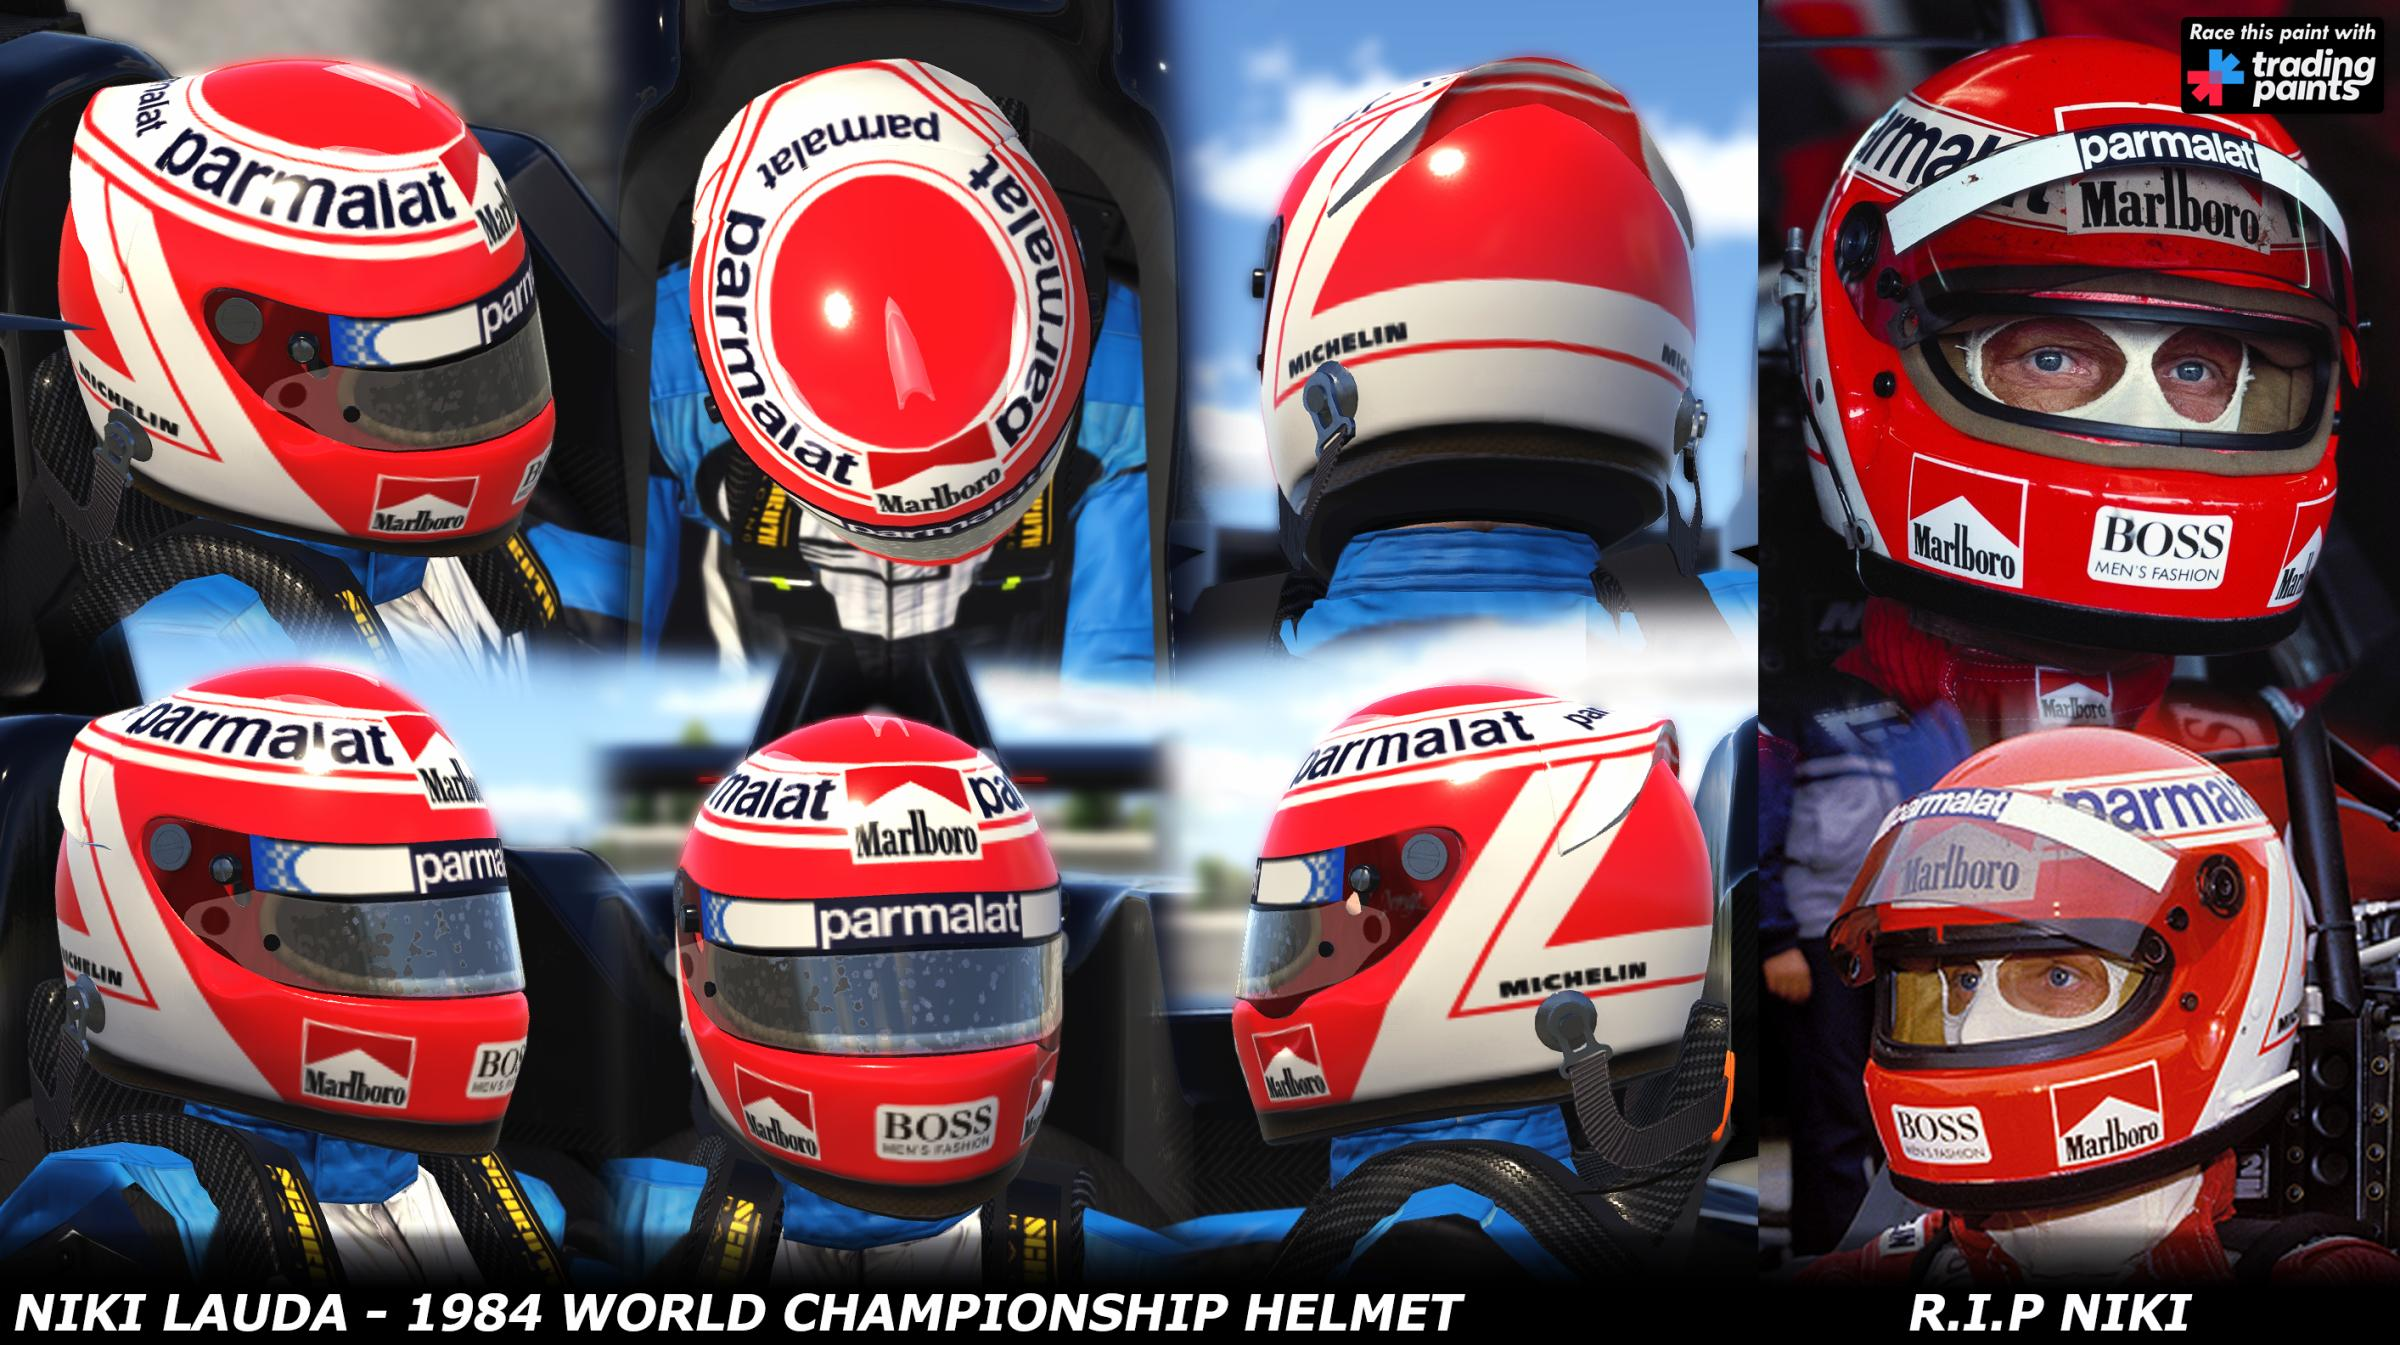 Preview of Niki Lauda - 1984 World Championship Helmet - R.I.P Niki by George Simmons